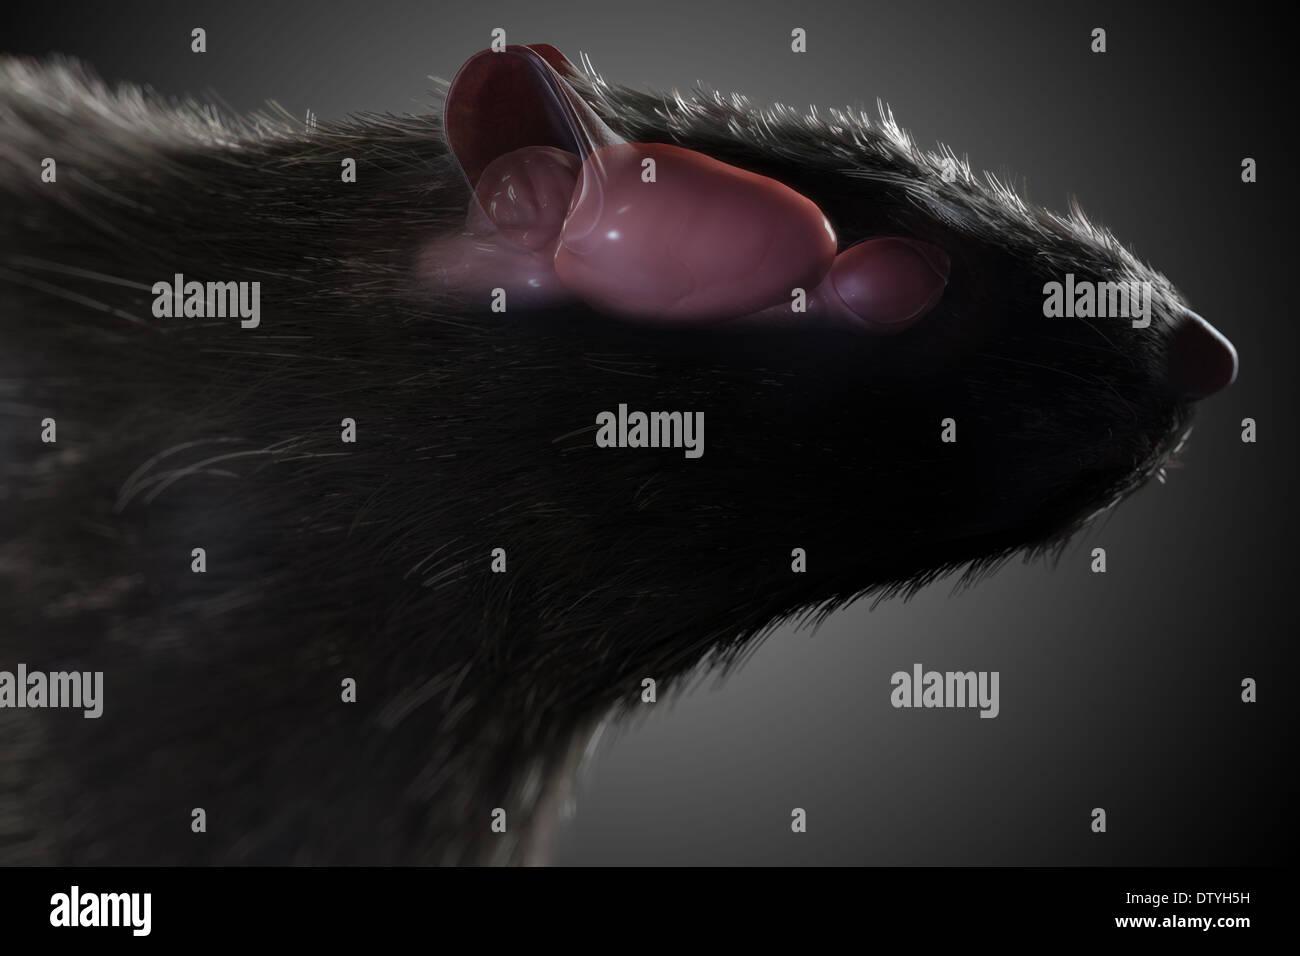 Rat Brain Anatomy Stock Photo: 66989037 - Alamy